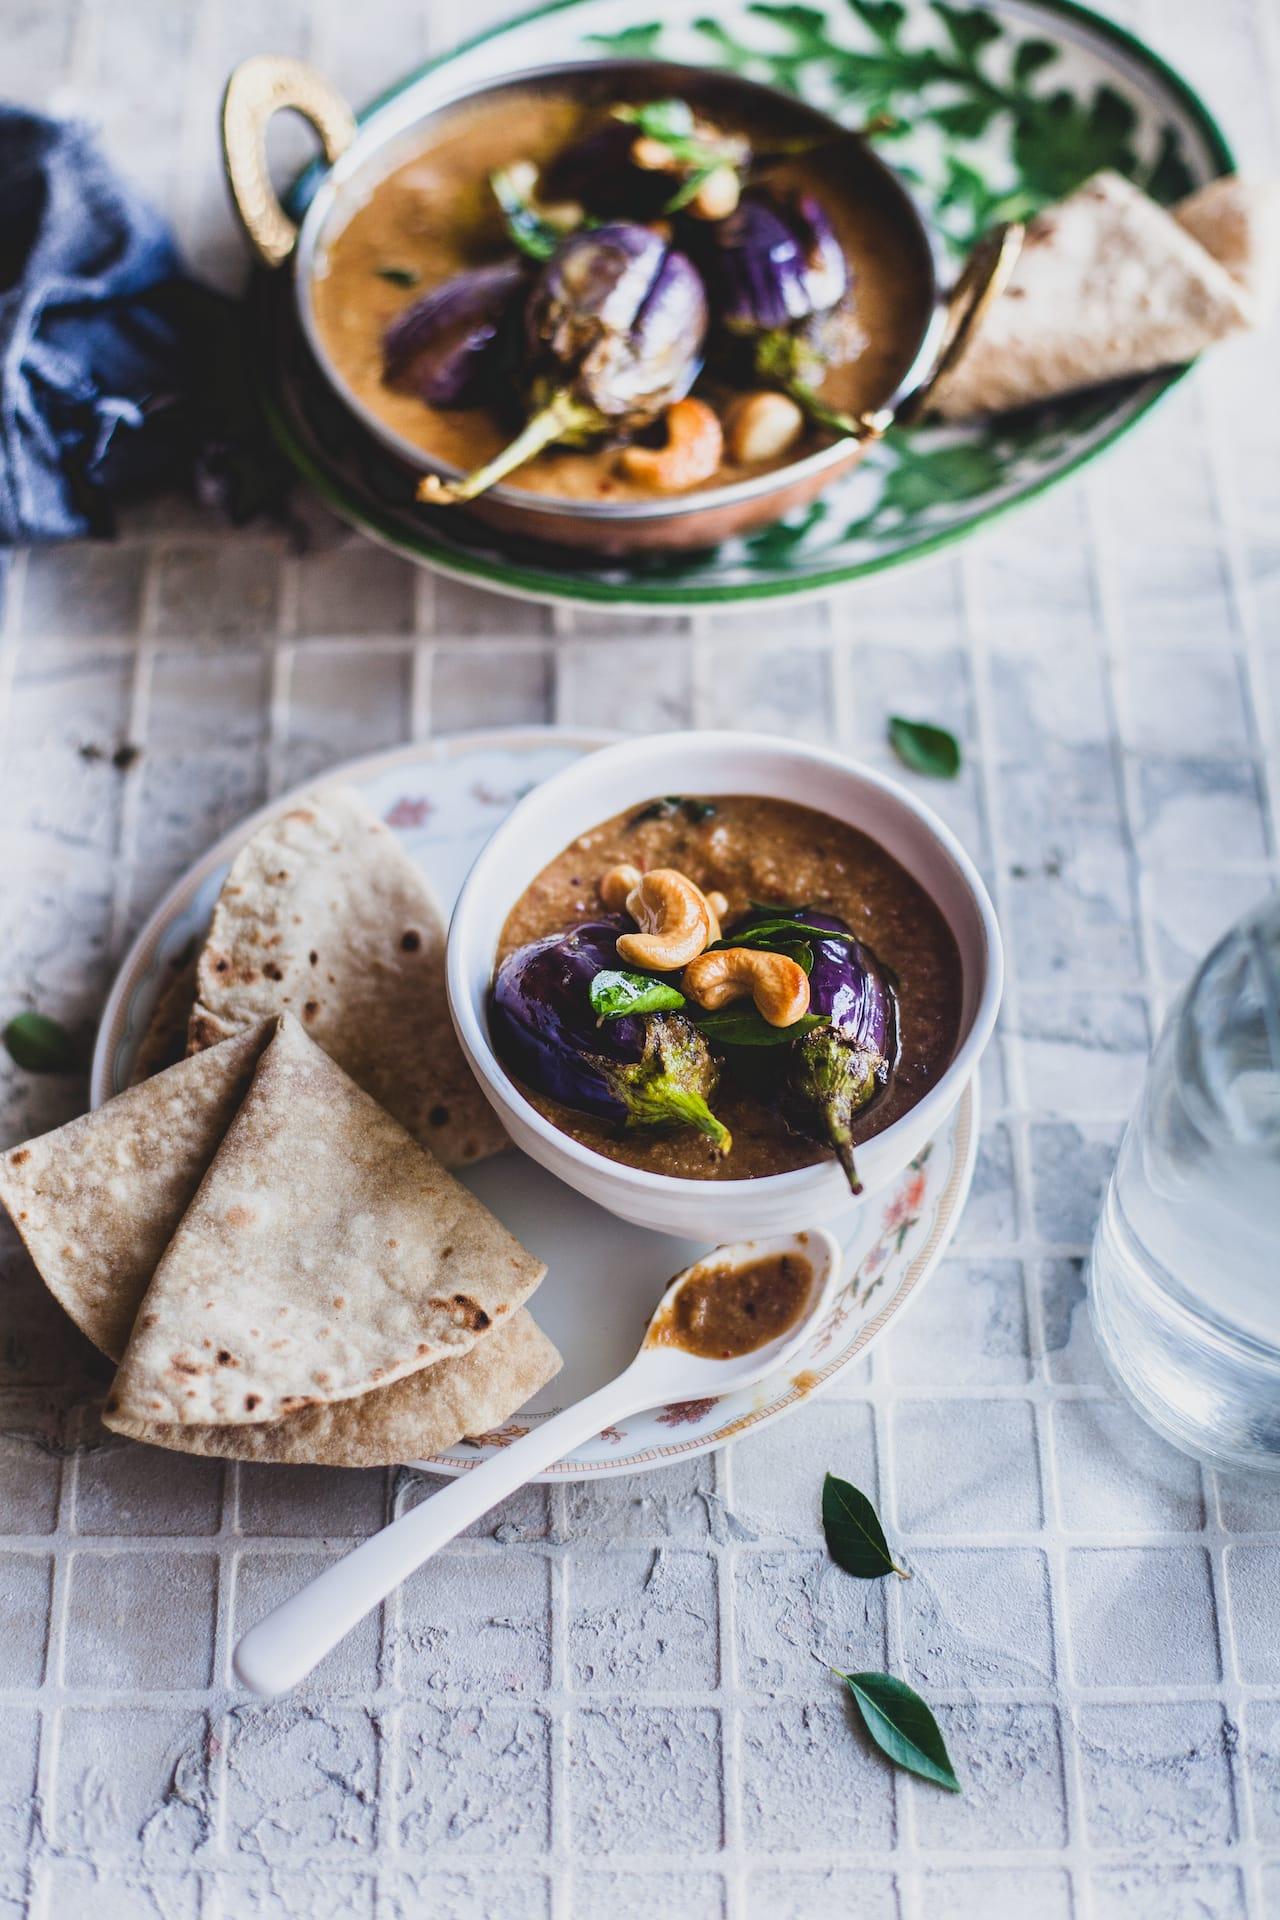 Baingan Ka Salan (Baby Eggplant In Coconut Cashew Gravy) | Playful Cooking